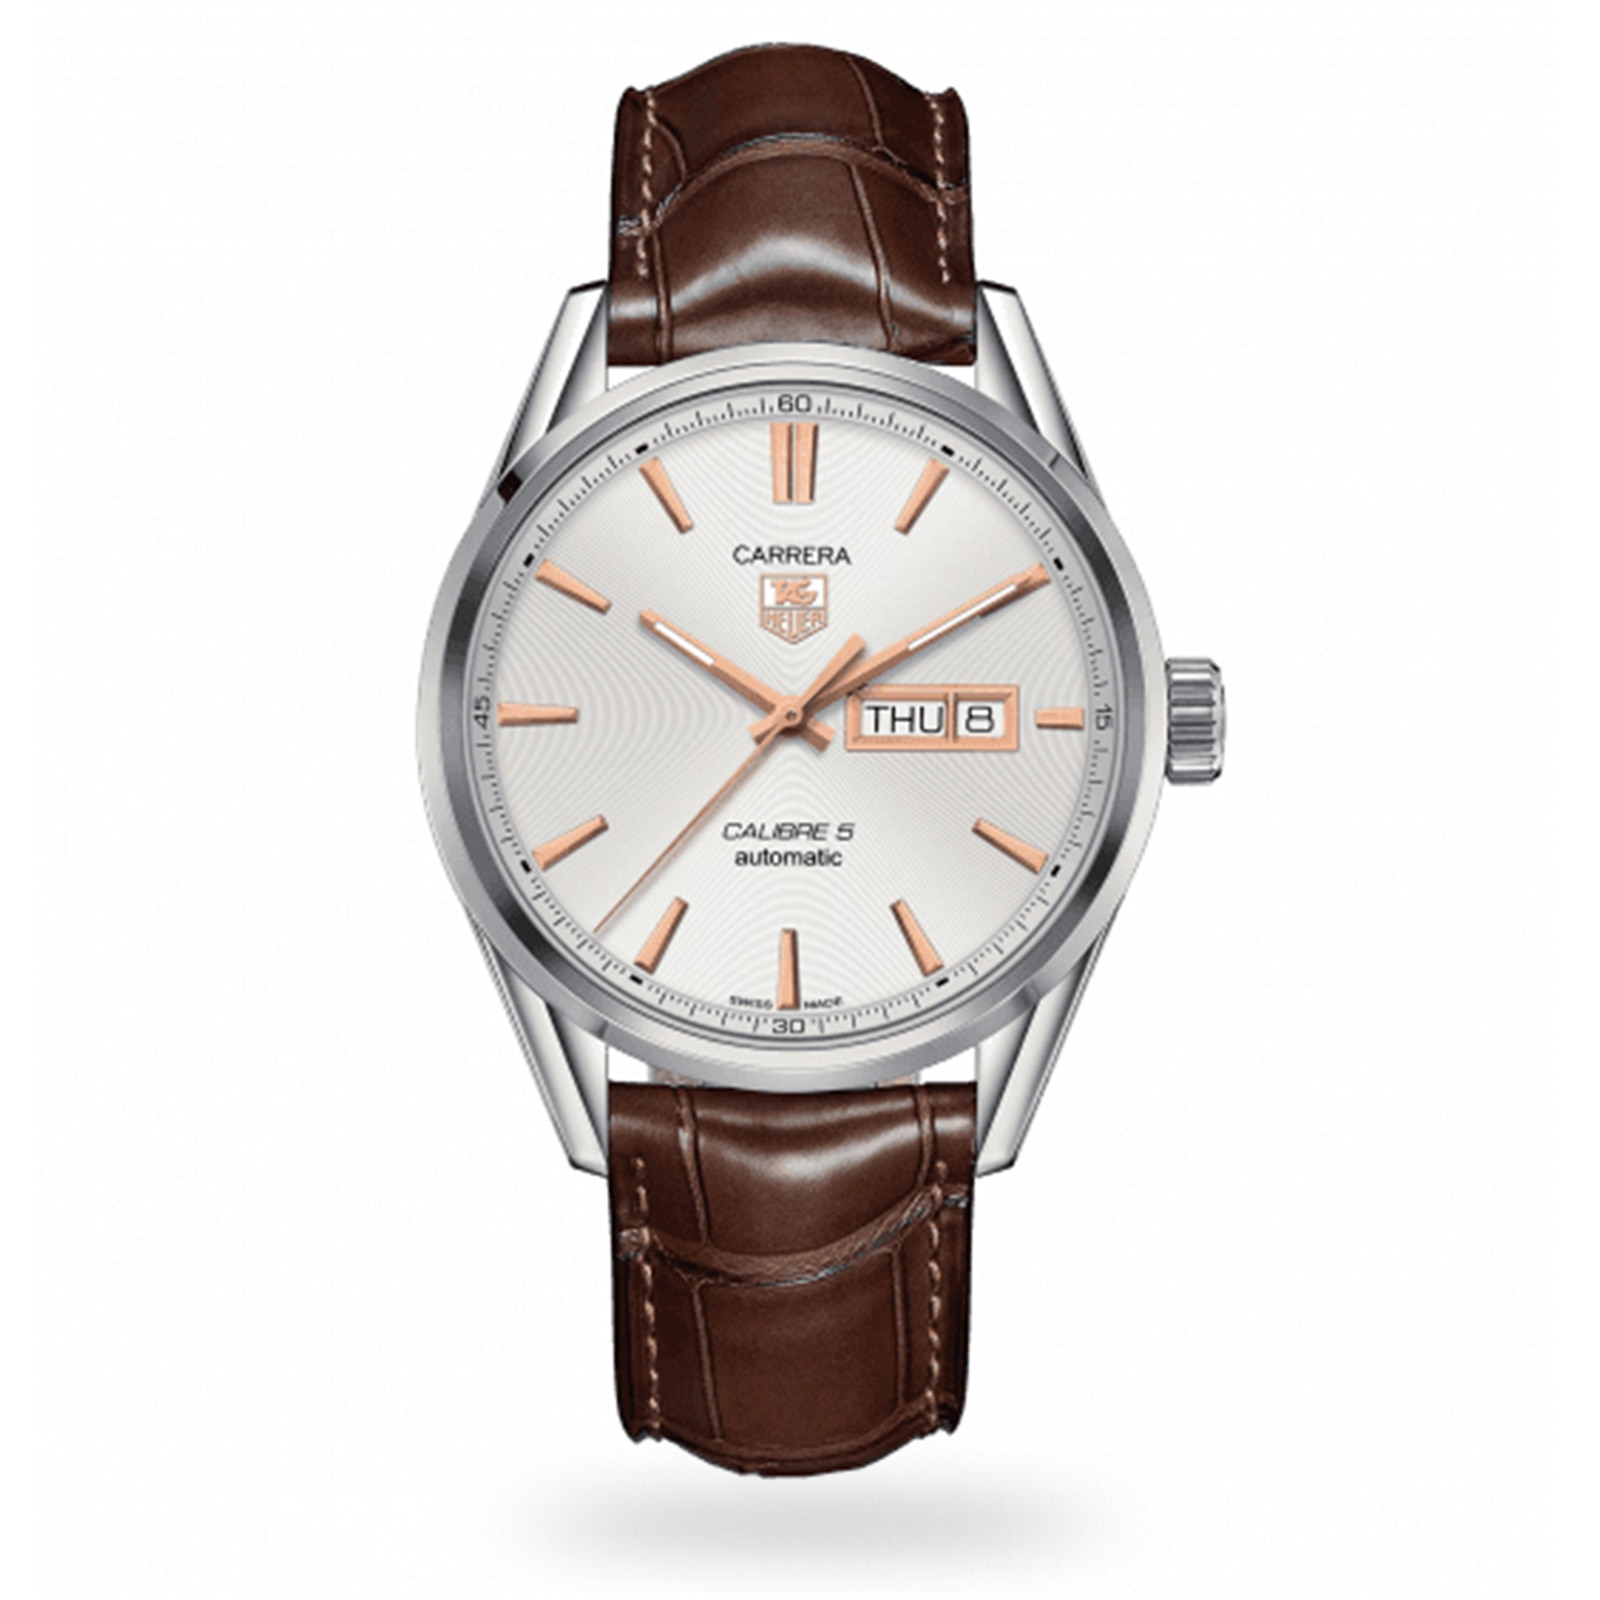 TAG Heuer Carrera Calibre 5 Day-Date Mens Watch